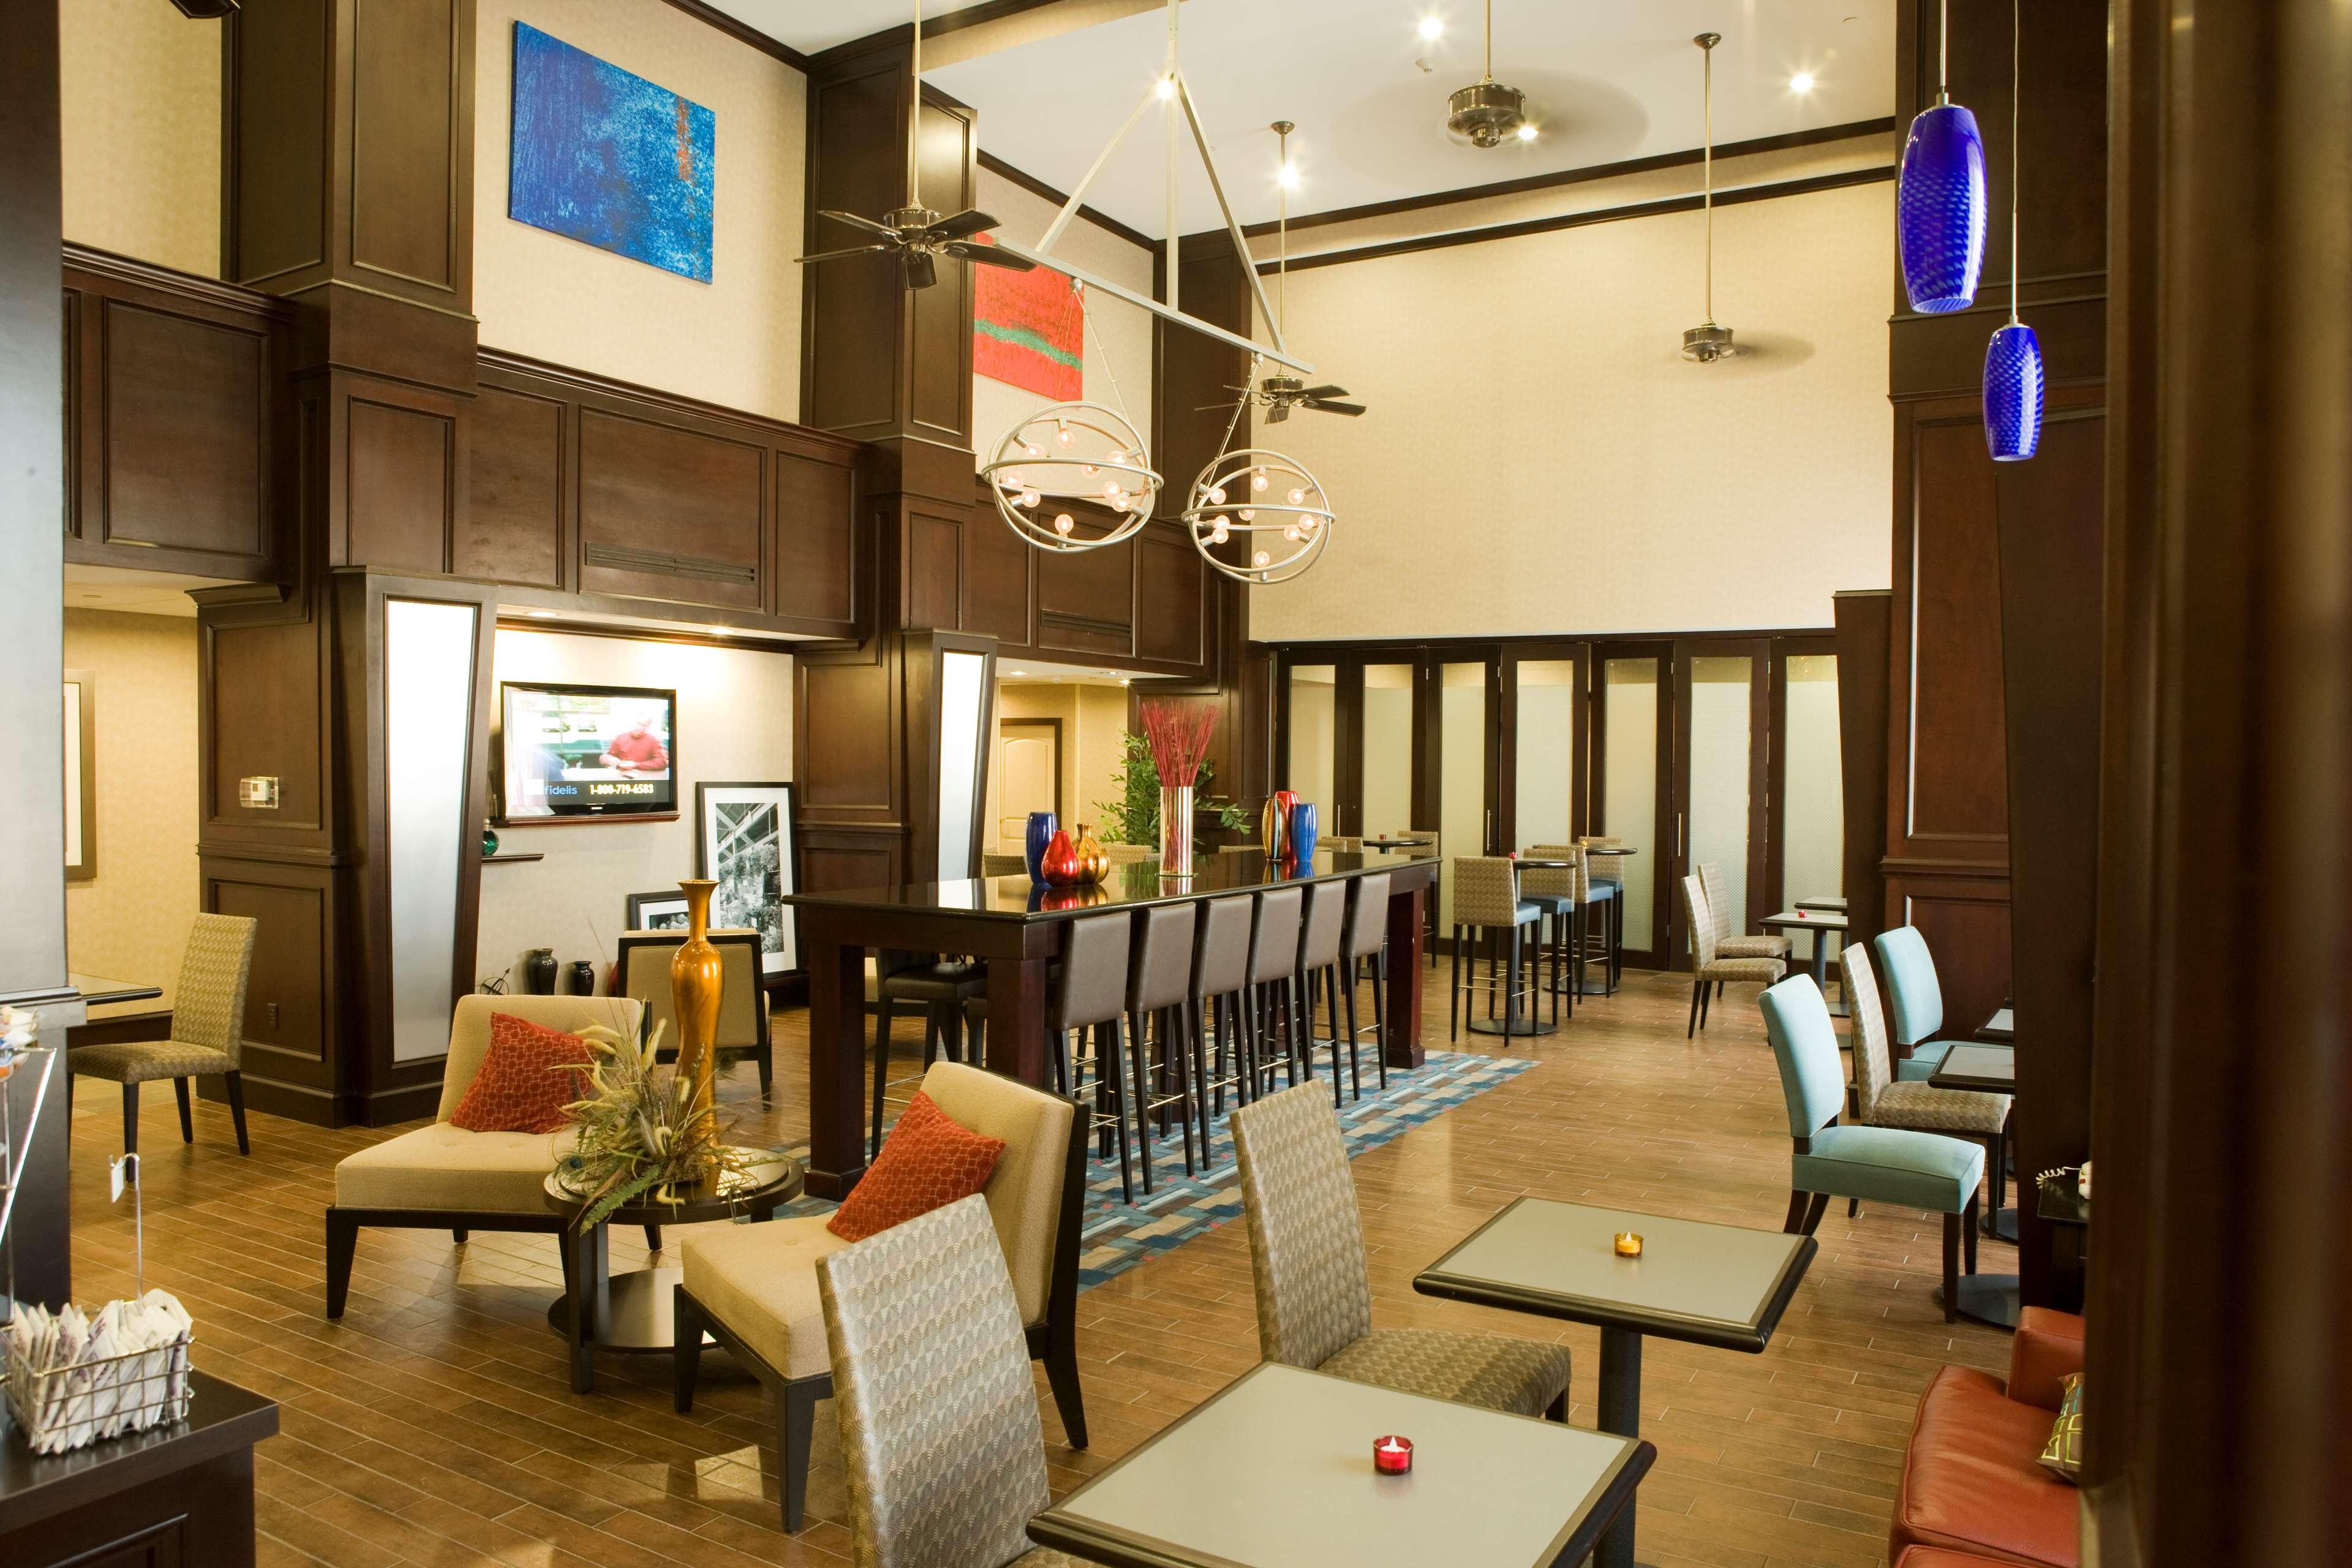 Hampton Inn & Suites Mount Pleasant image 6